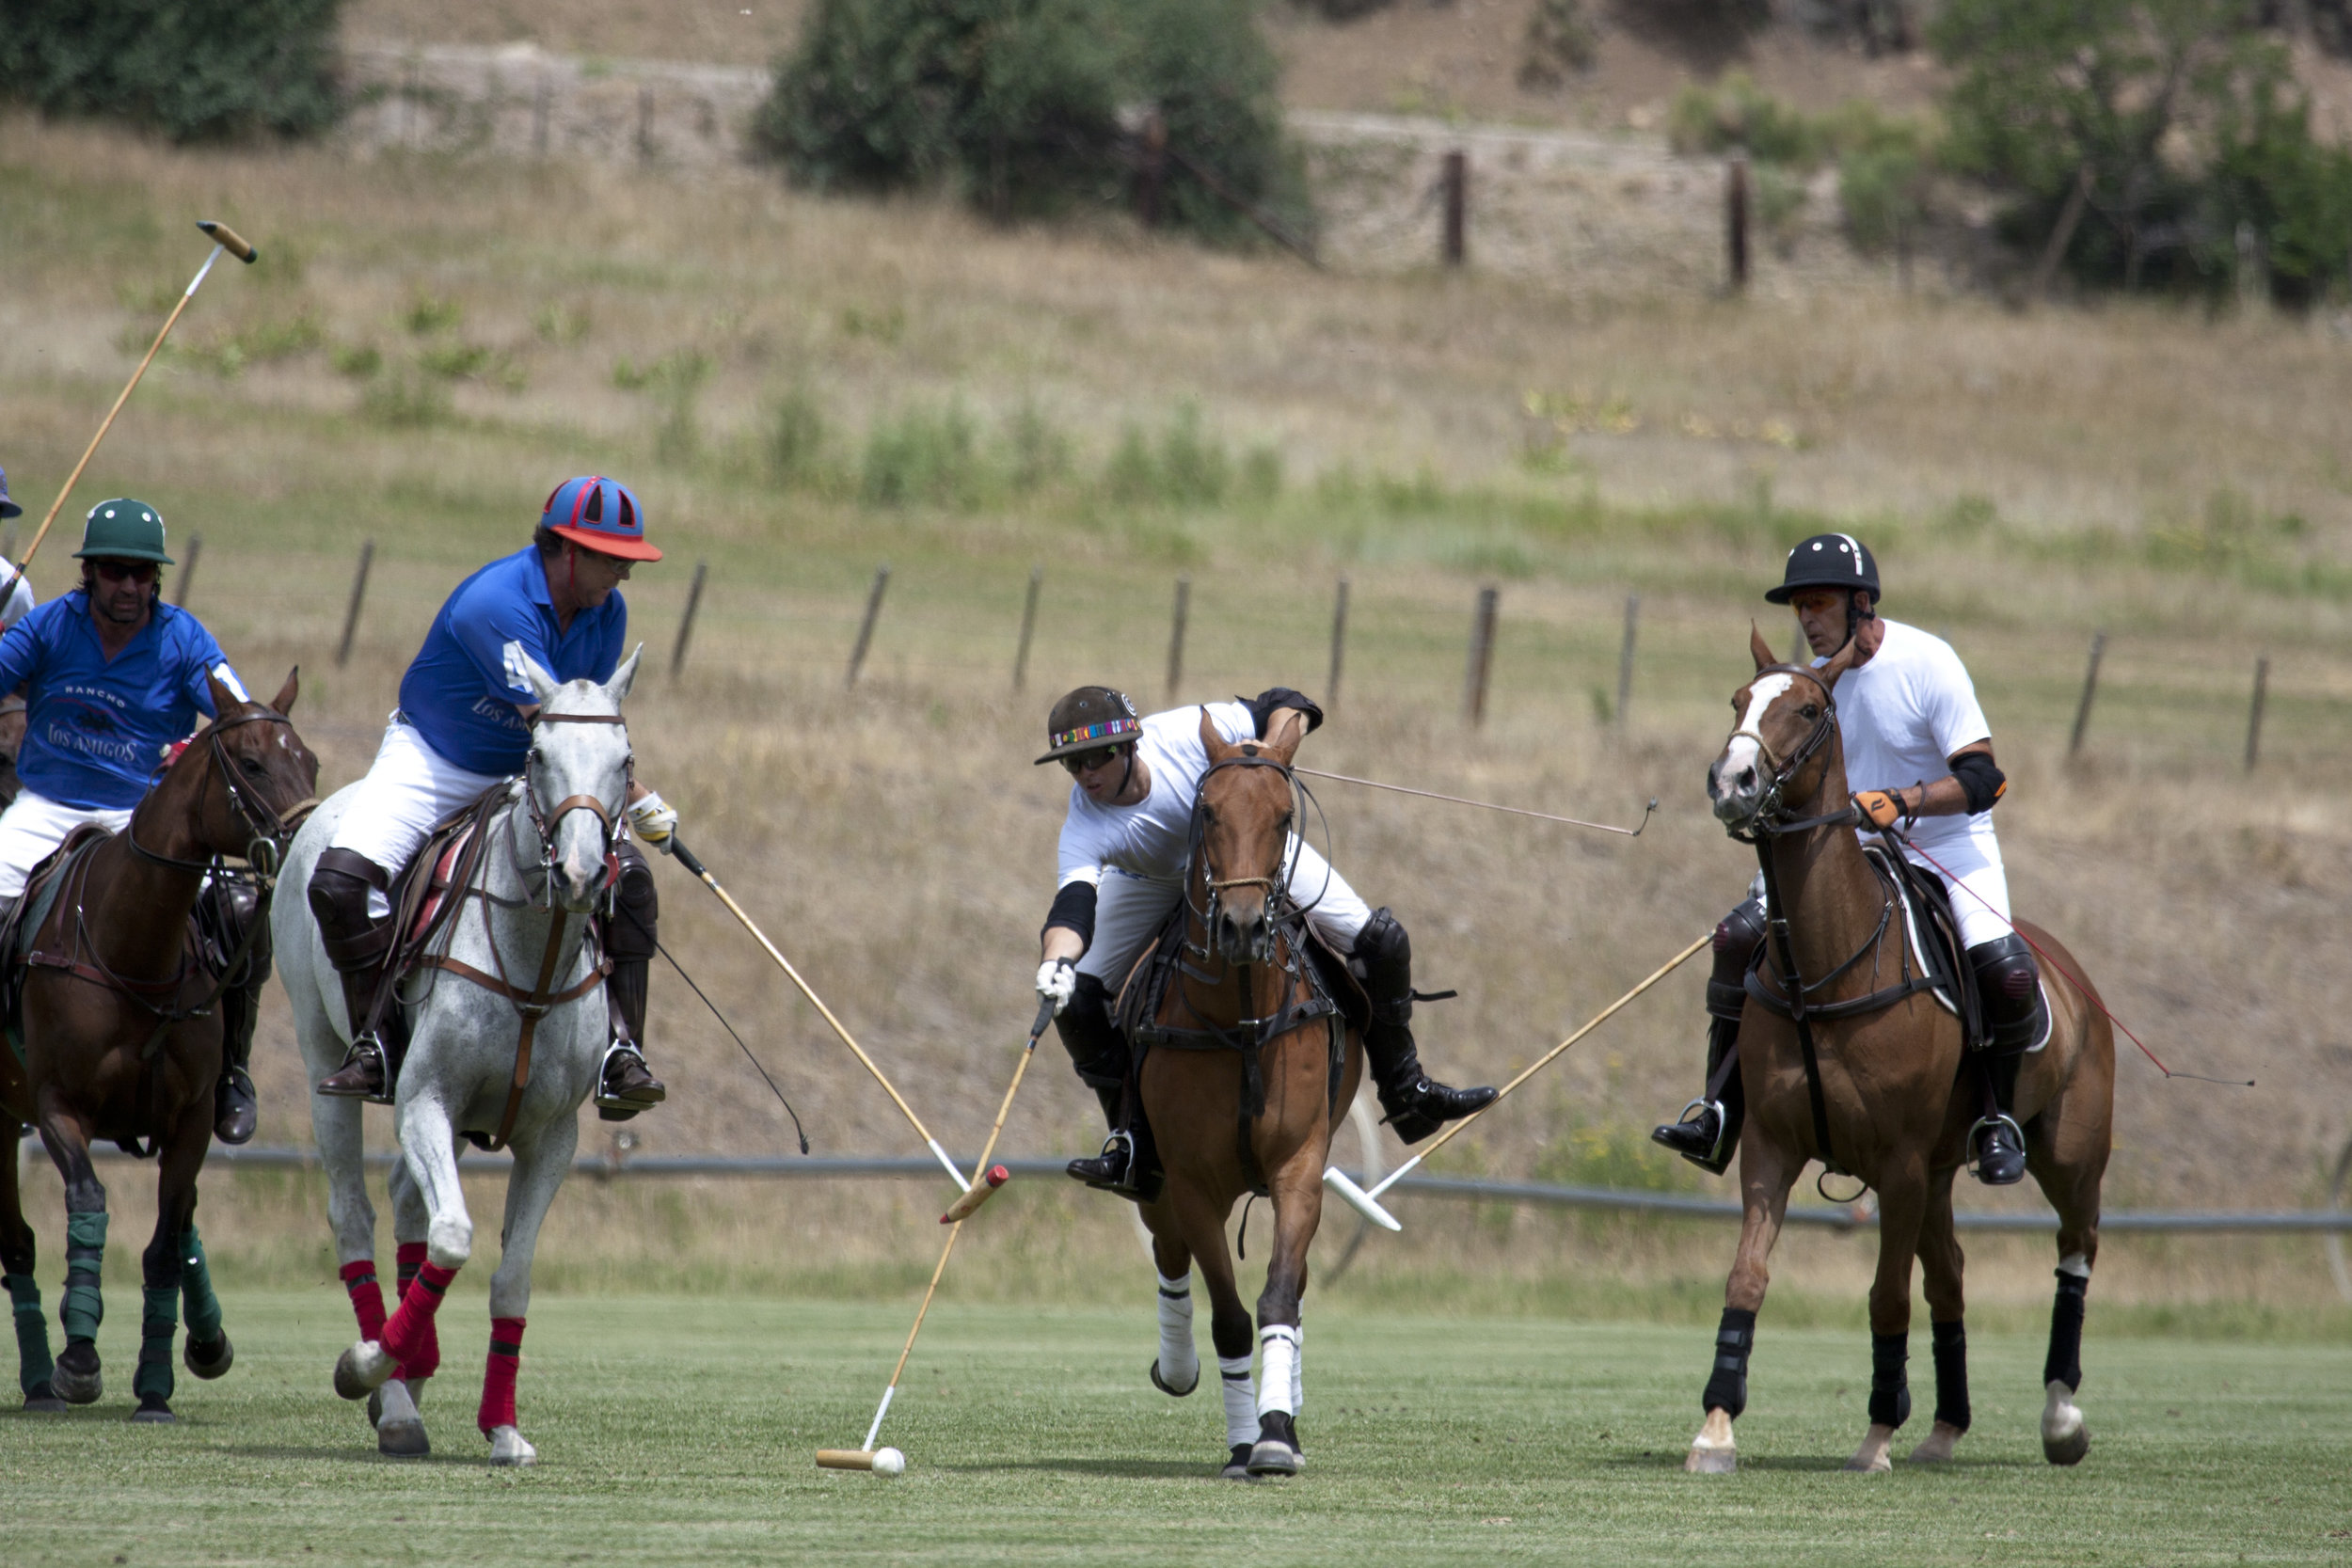 Carlitos Gracida of Piocho Ranch attempts to hit the ball a.JPG